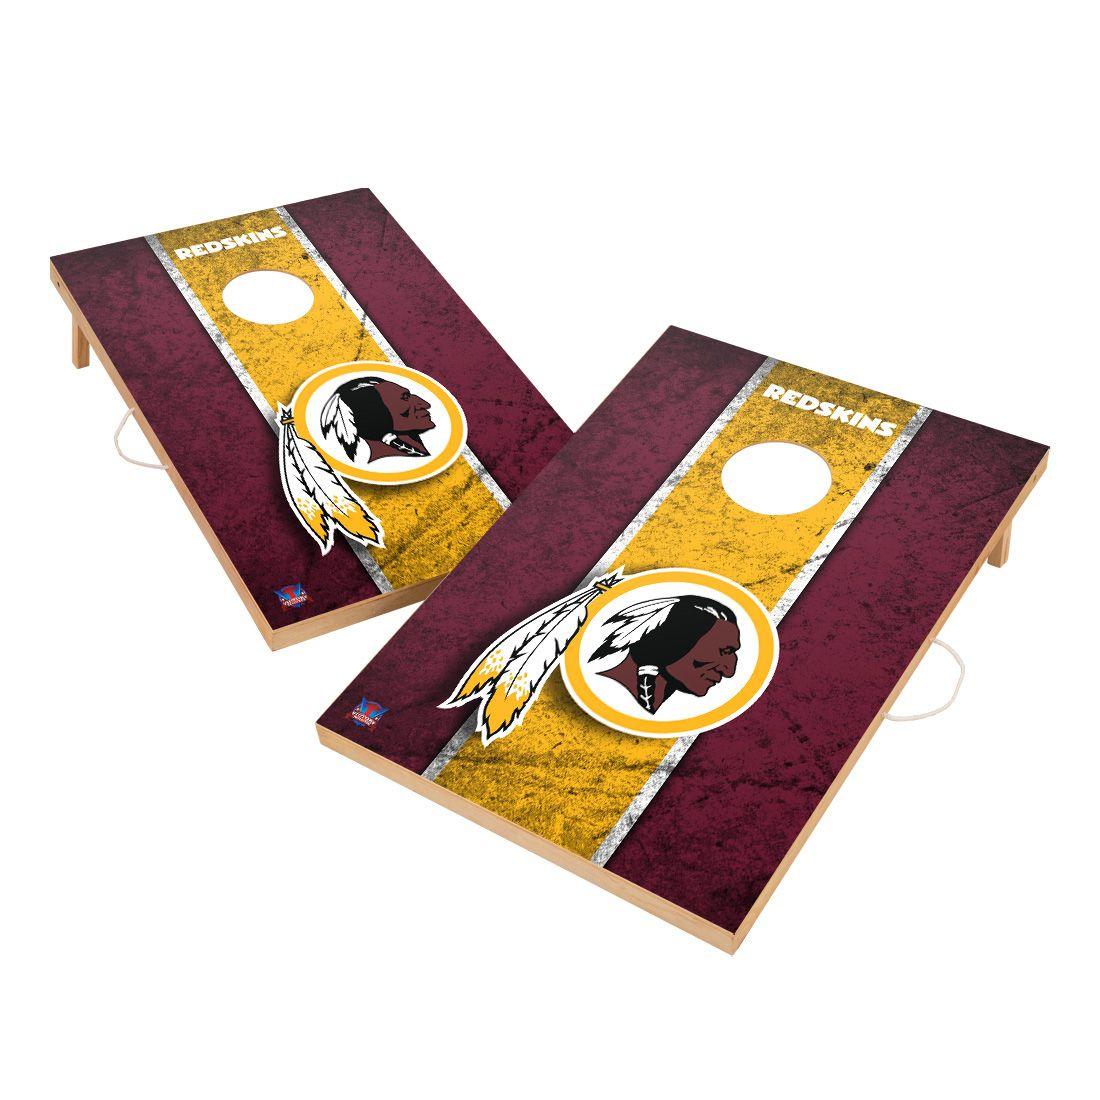 Vintage Washington Redskins NFL VT - Solid Wood 2x3 Cornhole